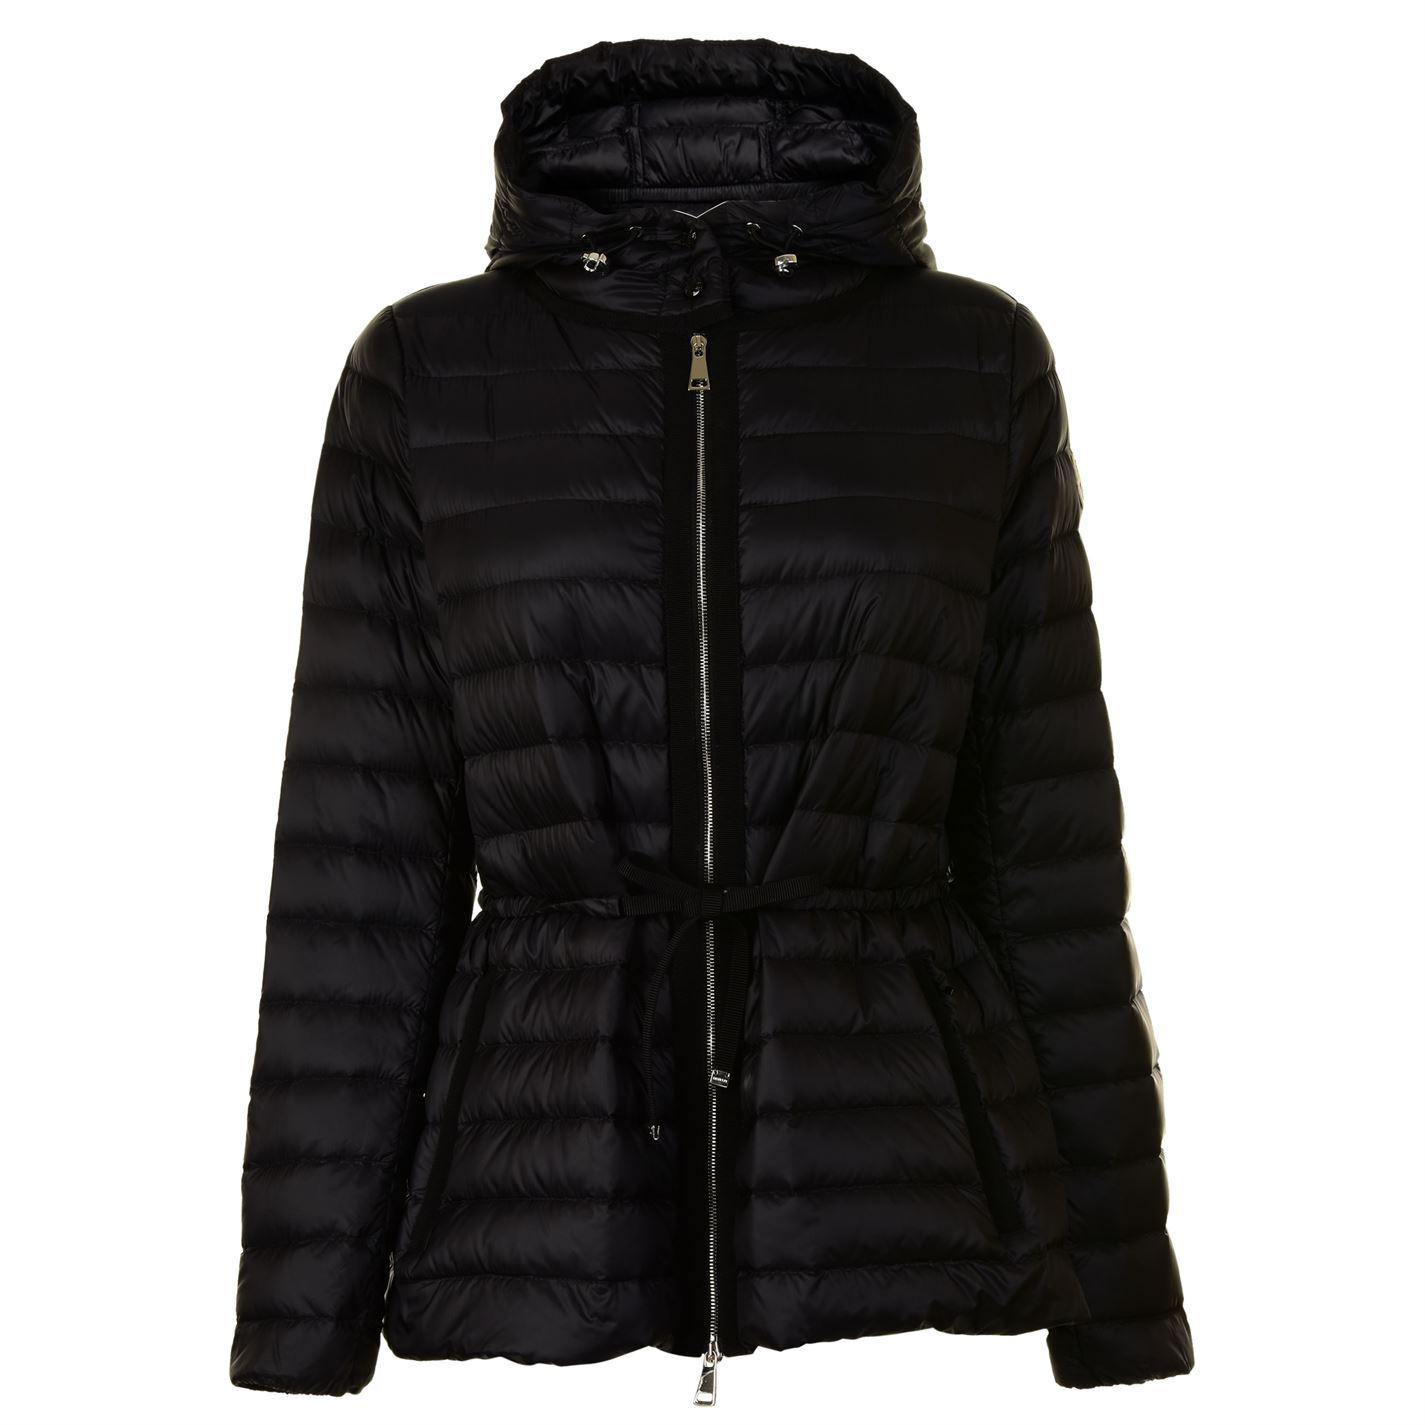 Moncler. Women's Black Raie Jacket